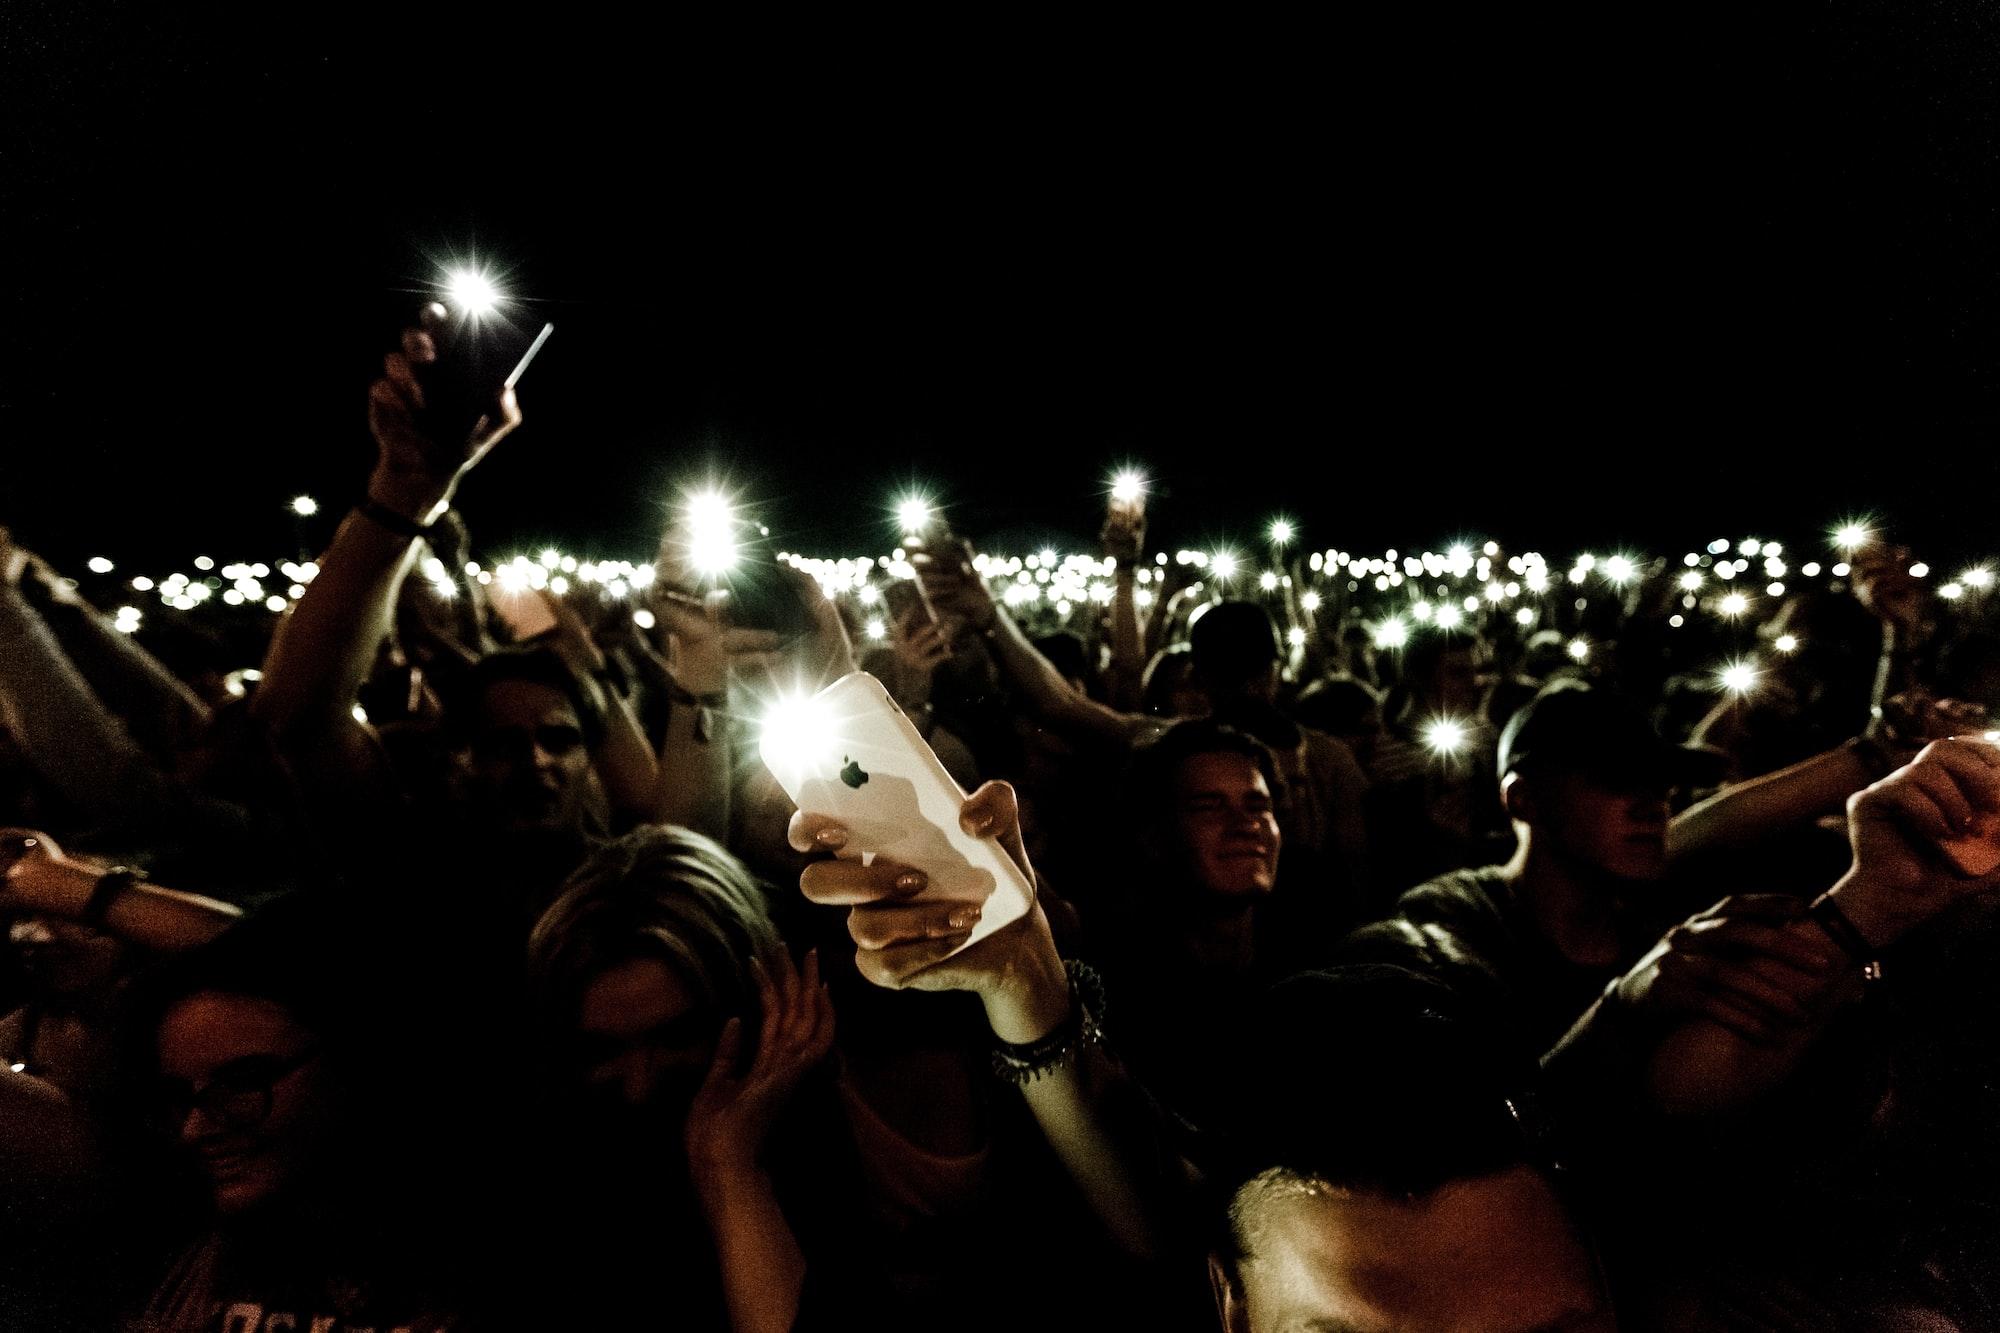 Как исправить автоматическое включение фонарика на iPhone